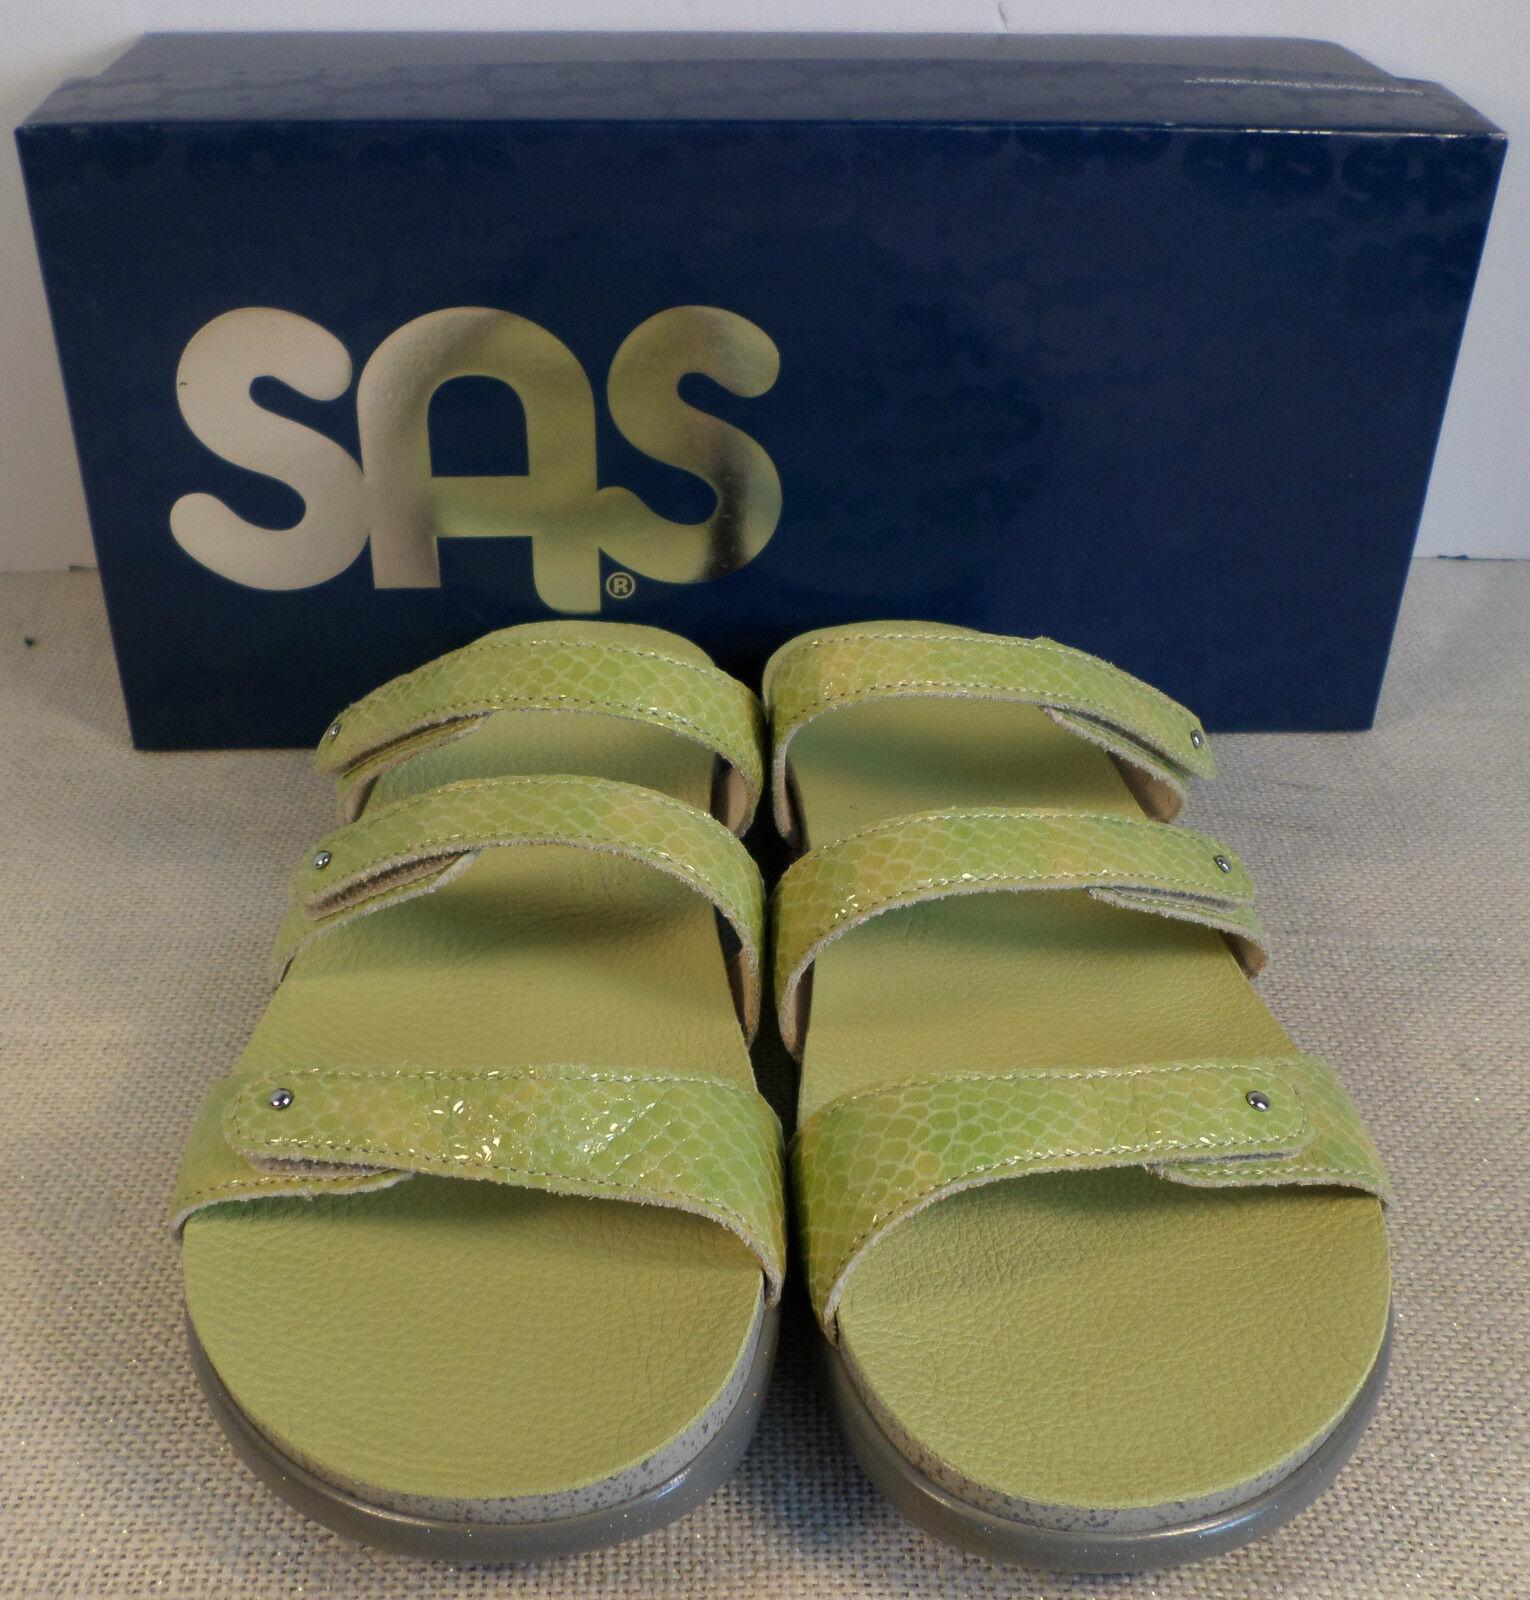 SAS ISKIA LIMA WOMEN'S WOMEN'S WOMEN'S GREEN FLIP FLOP SANDALS NEW IN BOX bb69ce